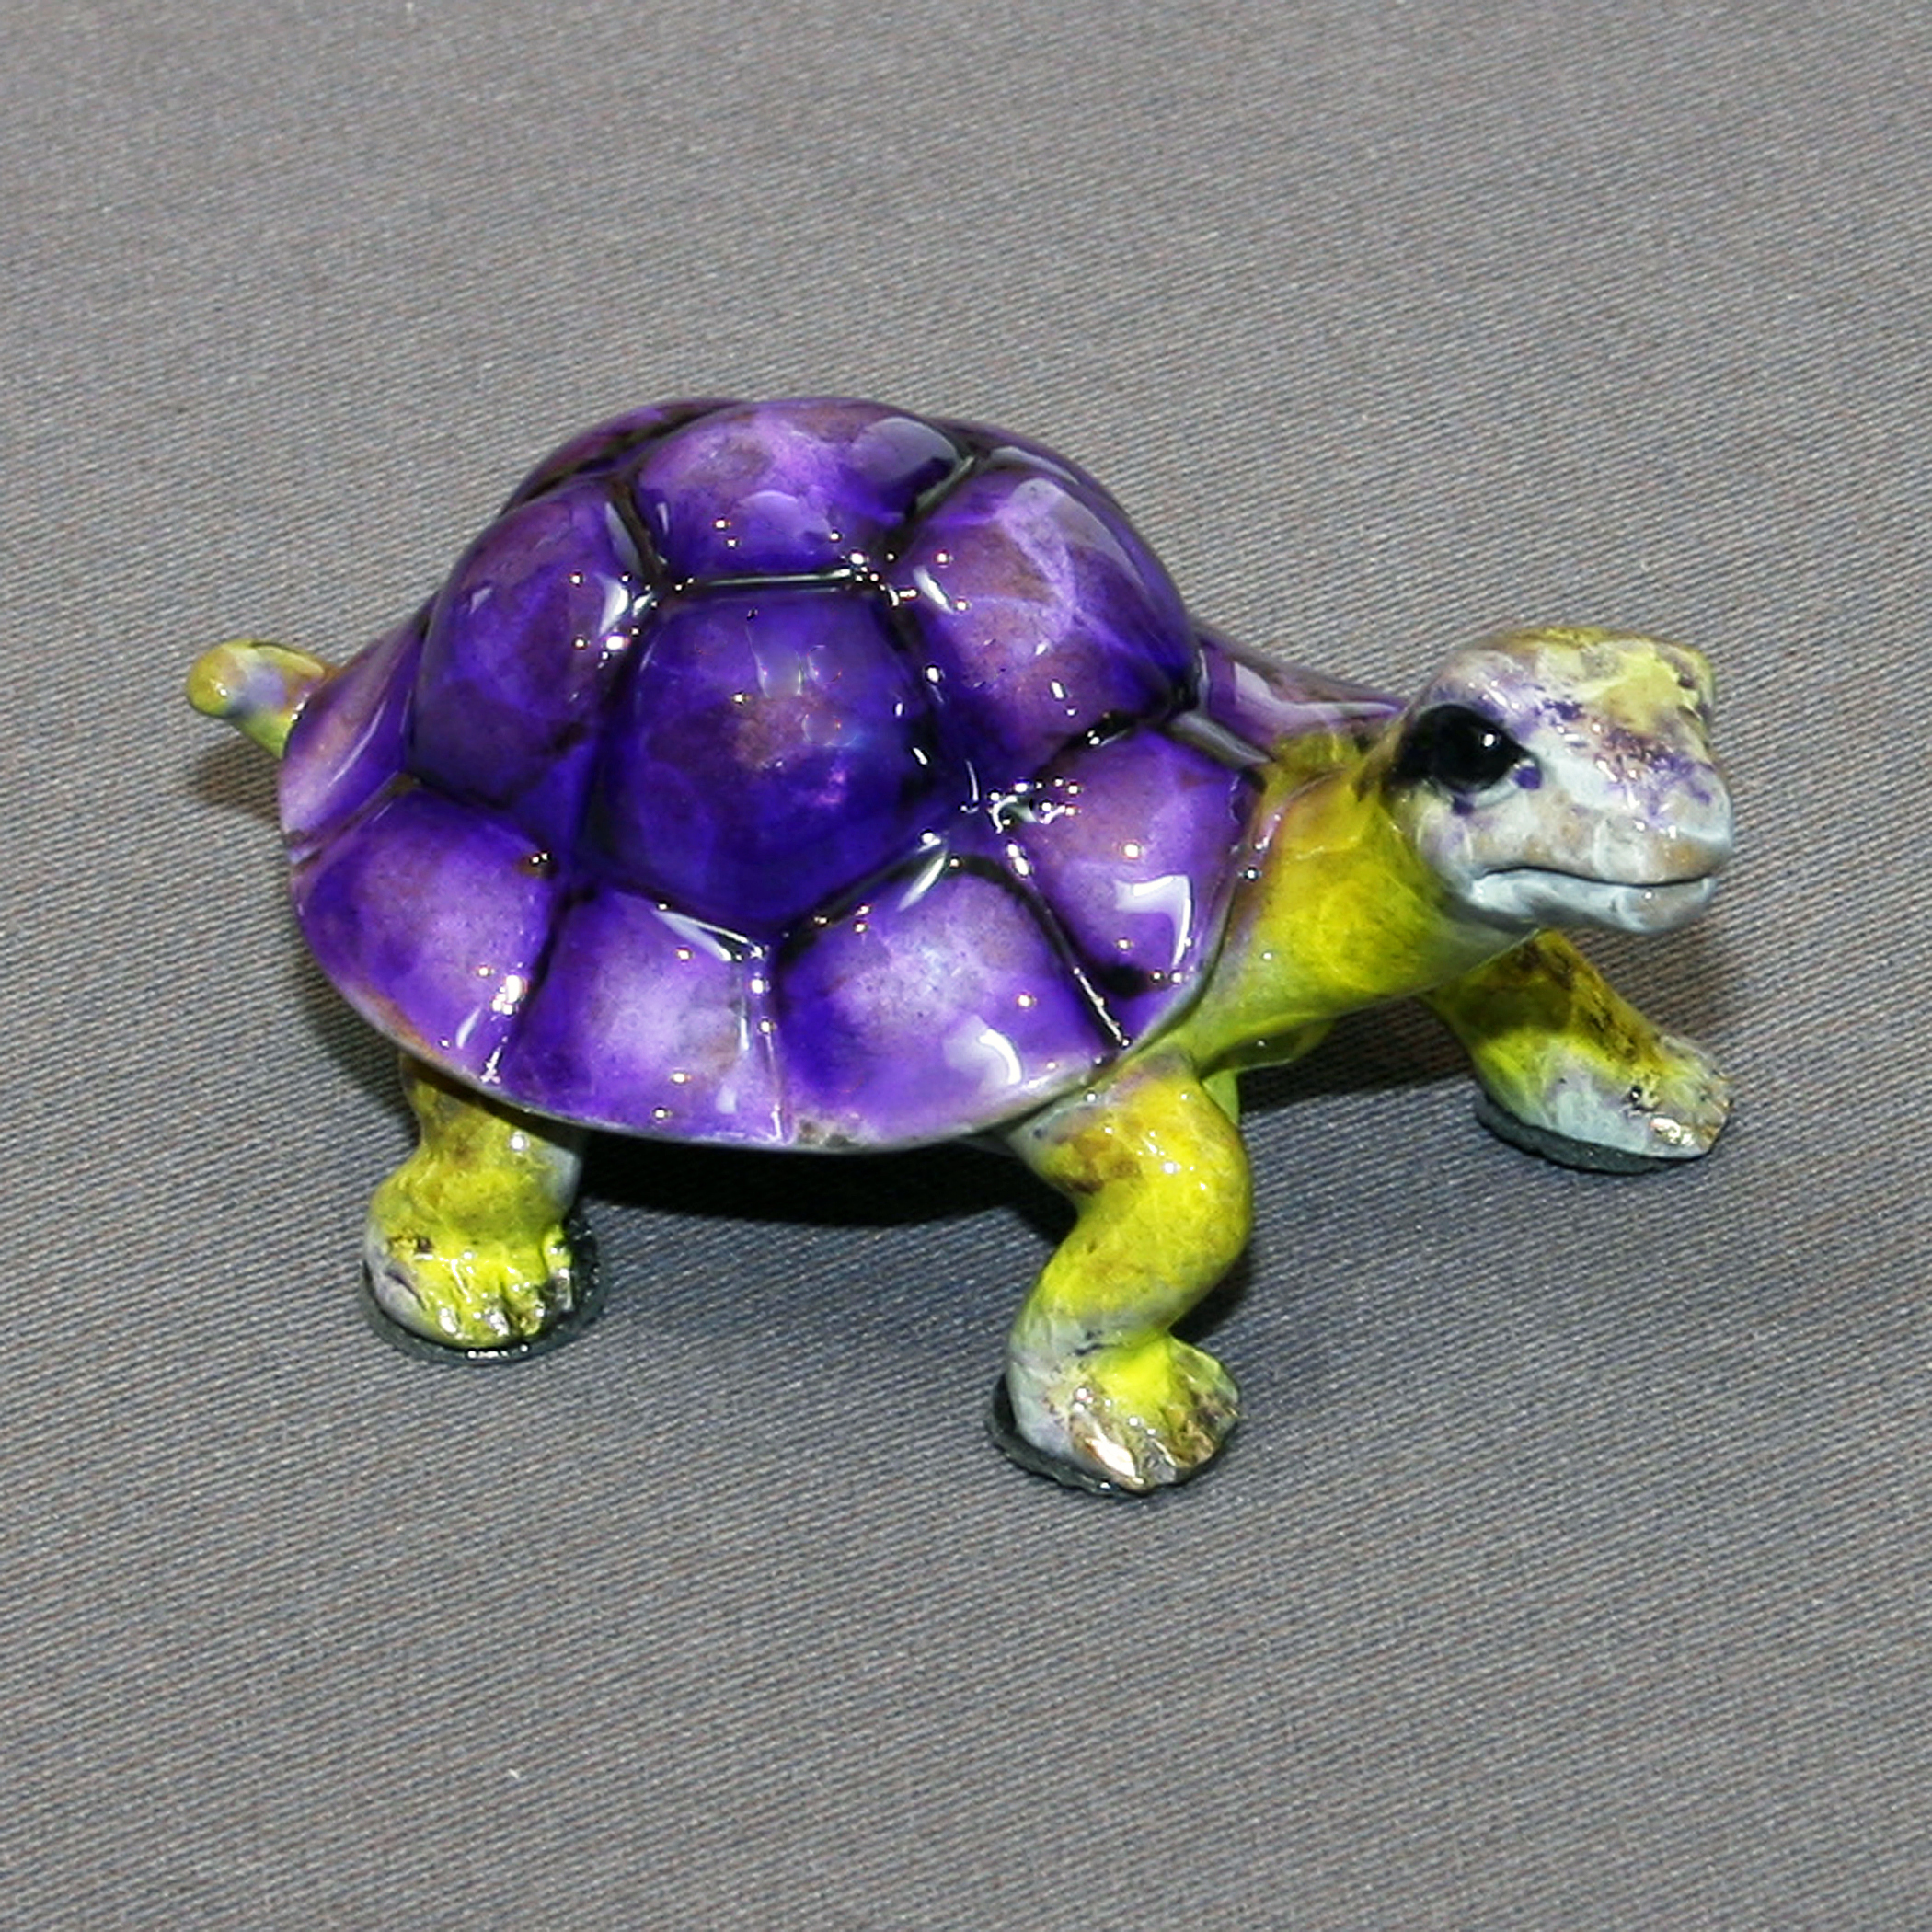 Turtle Yard Ornaments | Tortoise Garden Ornament ...